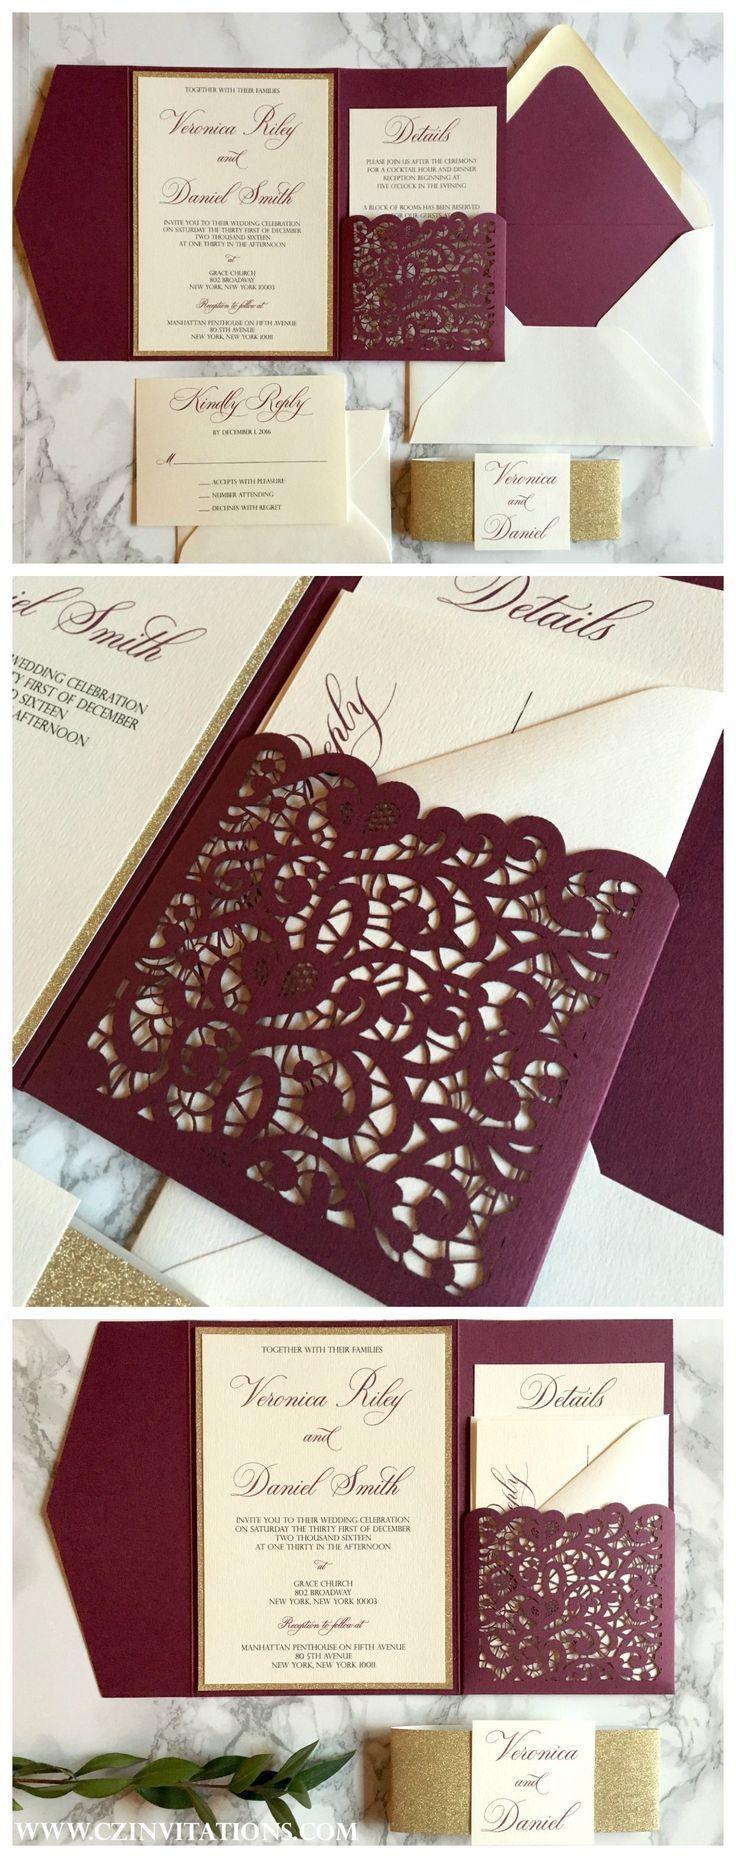 Pin On Cricut Silhouette Wedding Ideas